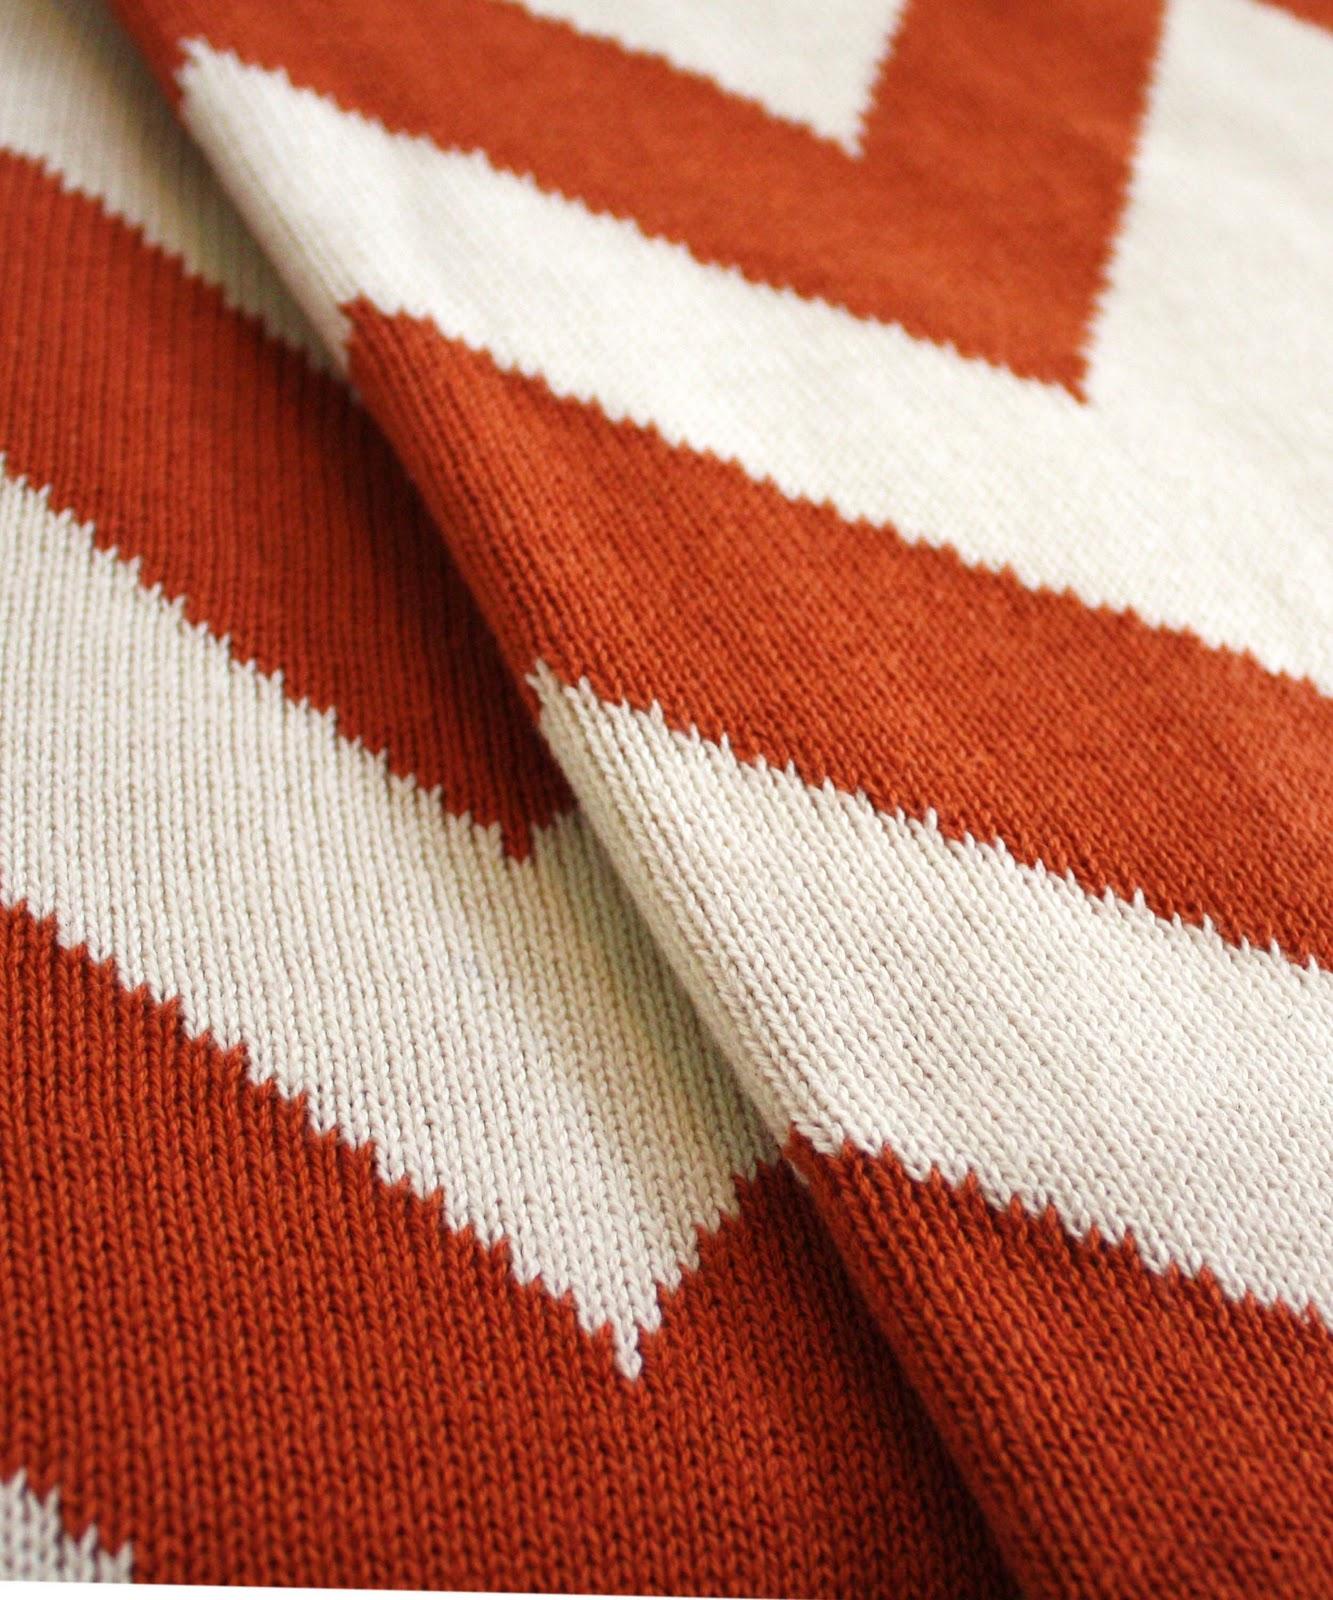 High Street Market: Graphic Knit Throw Blankets